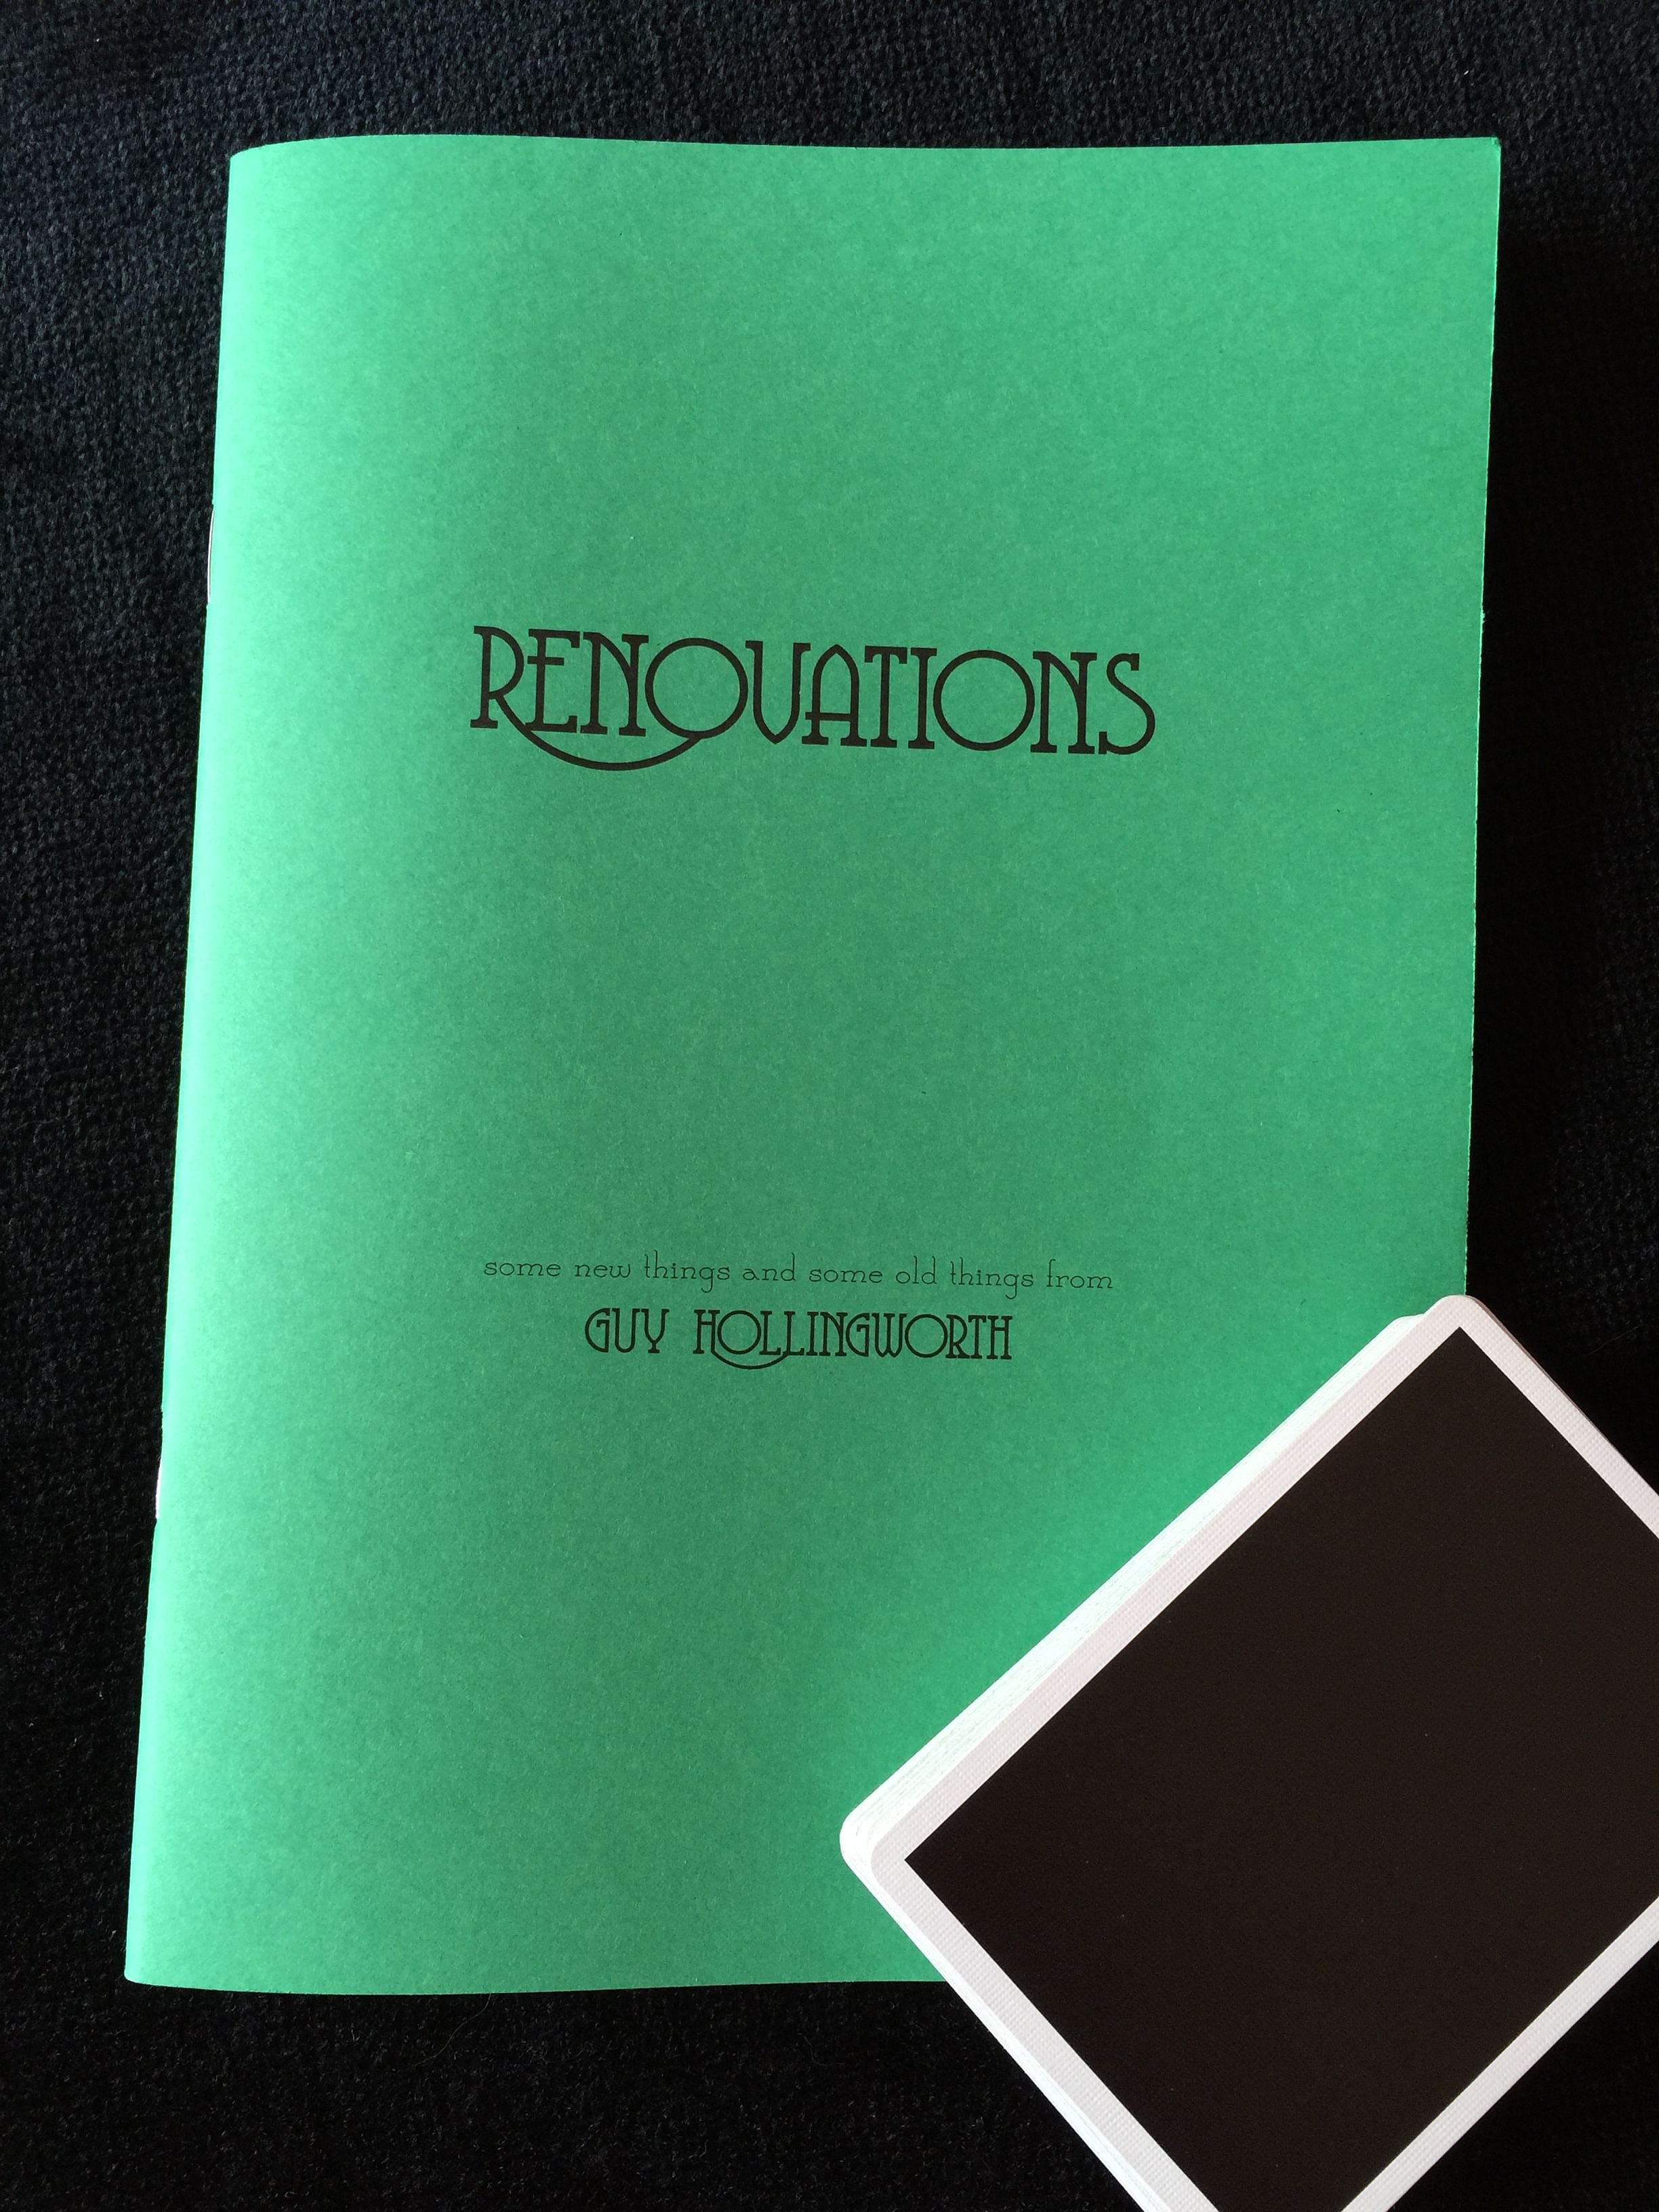 Guy Hollingworth's Renovations Book